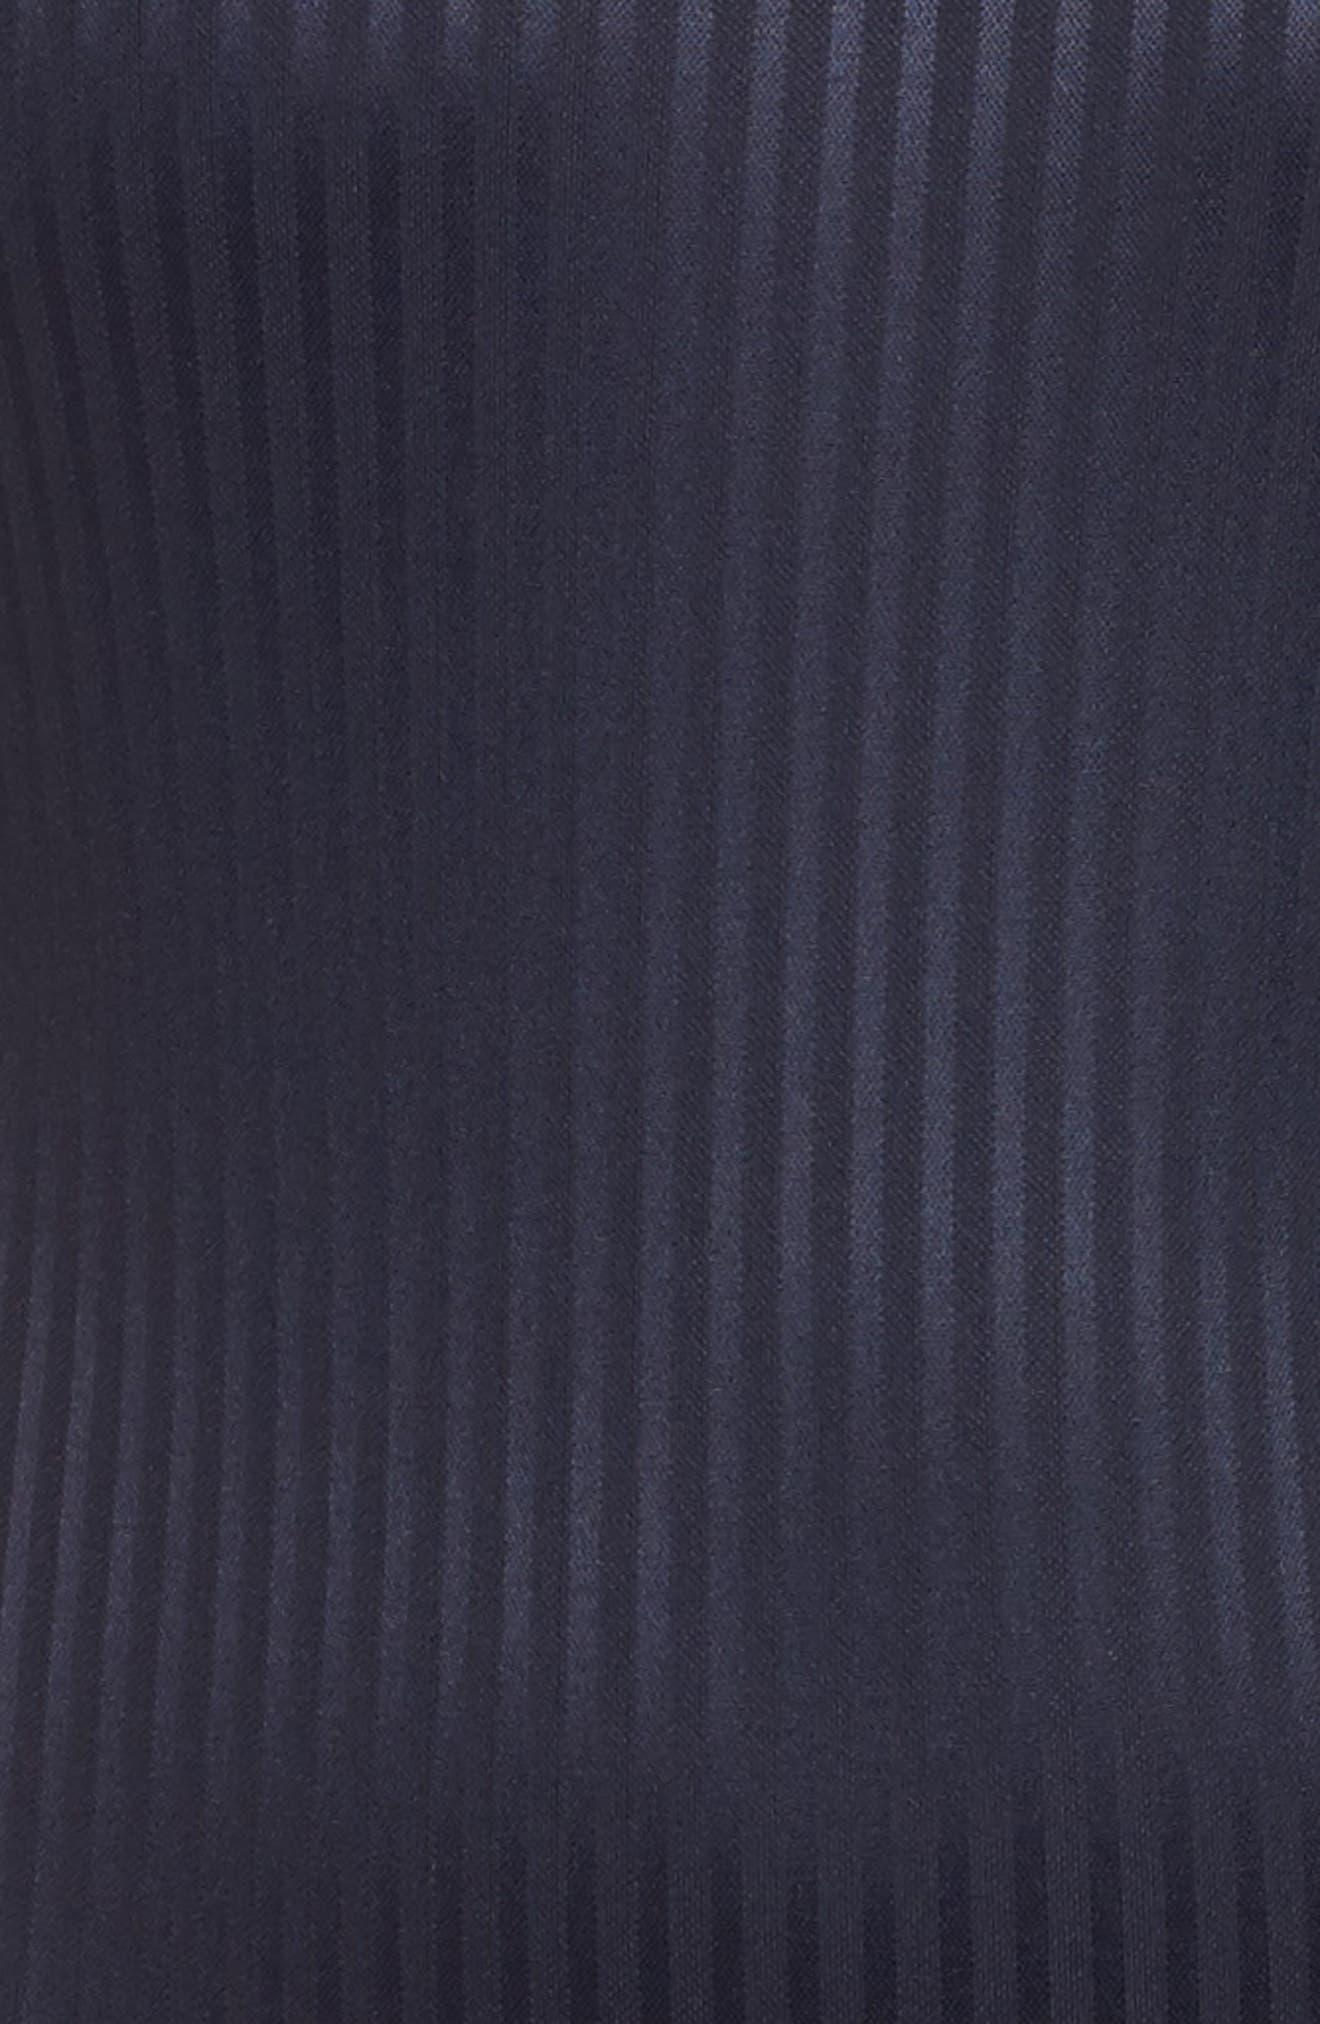 FENTY PUMA by Rihanna Bodysuit,                             Alternate thumbnail 5, color,                             400